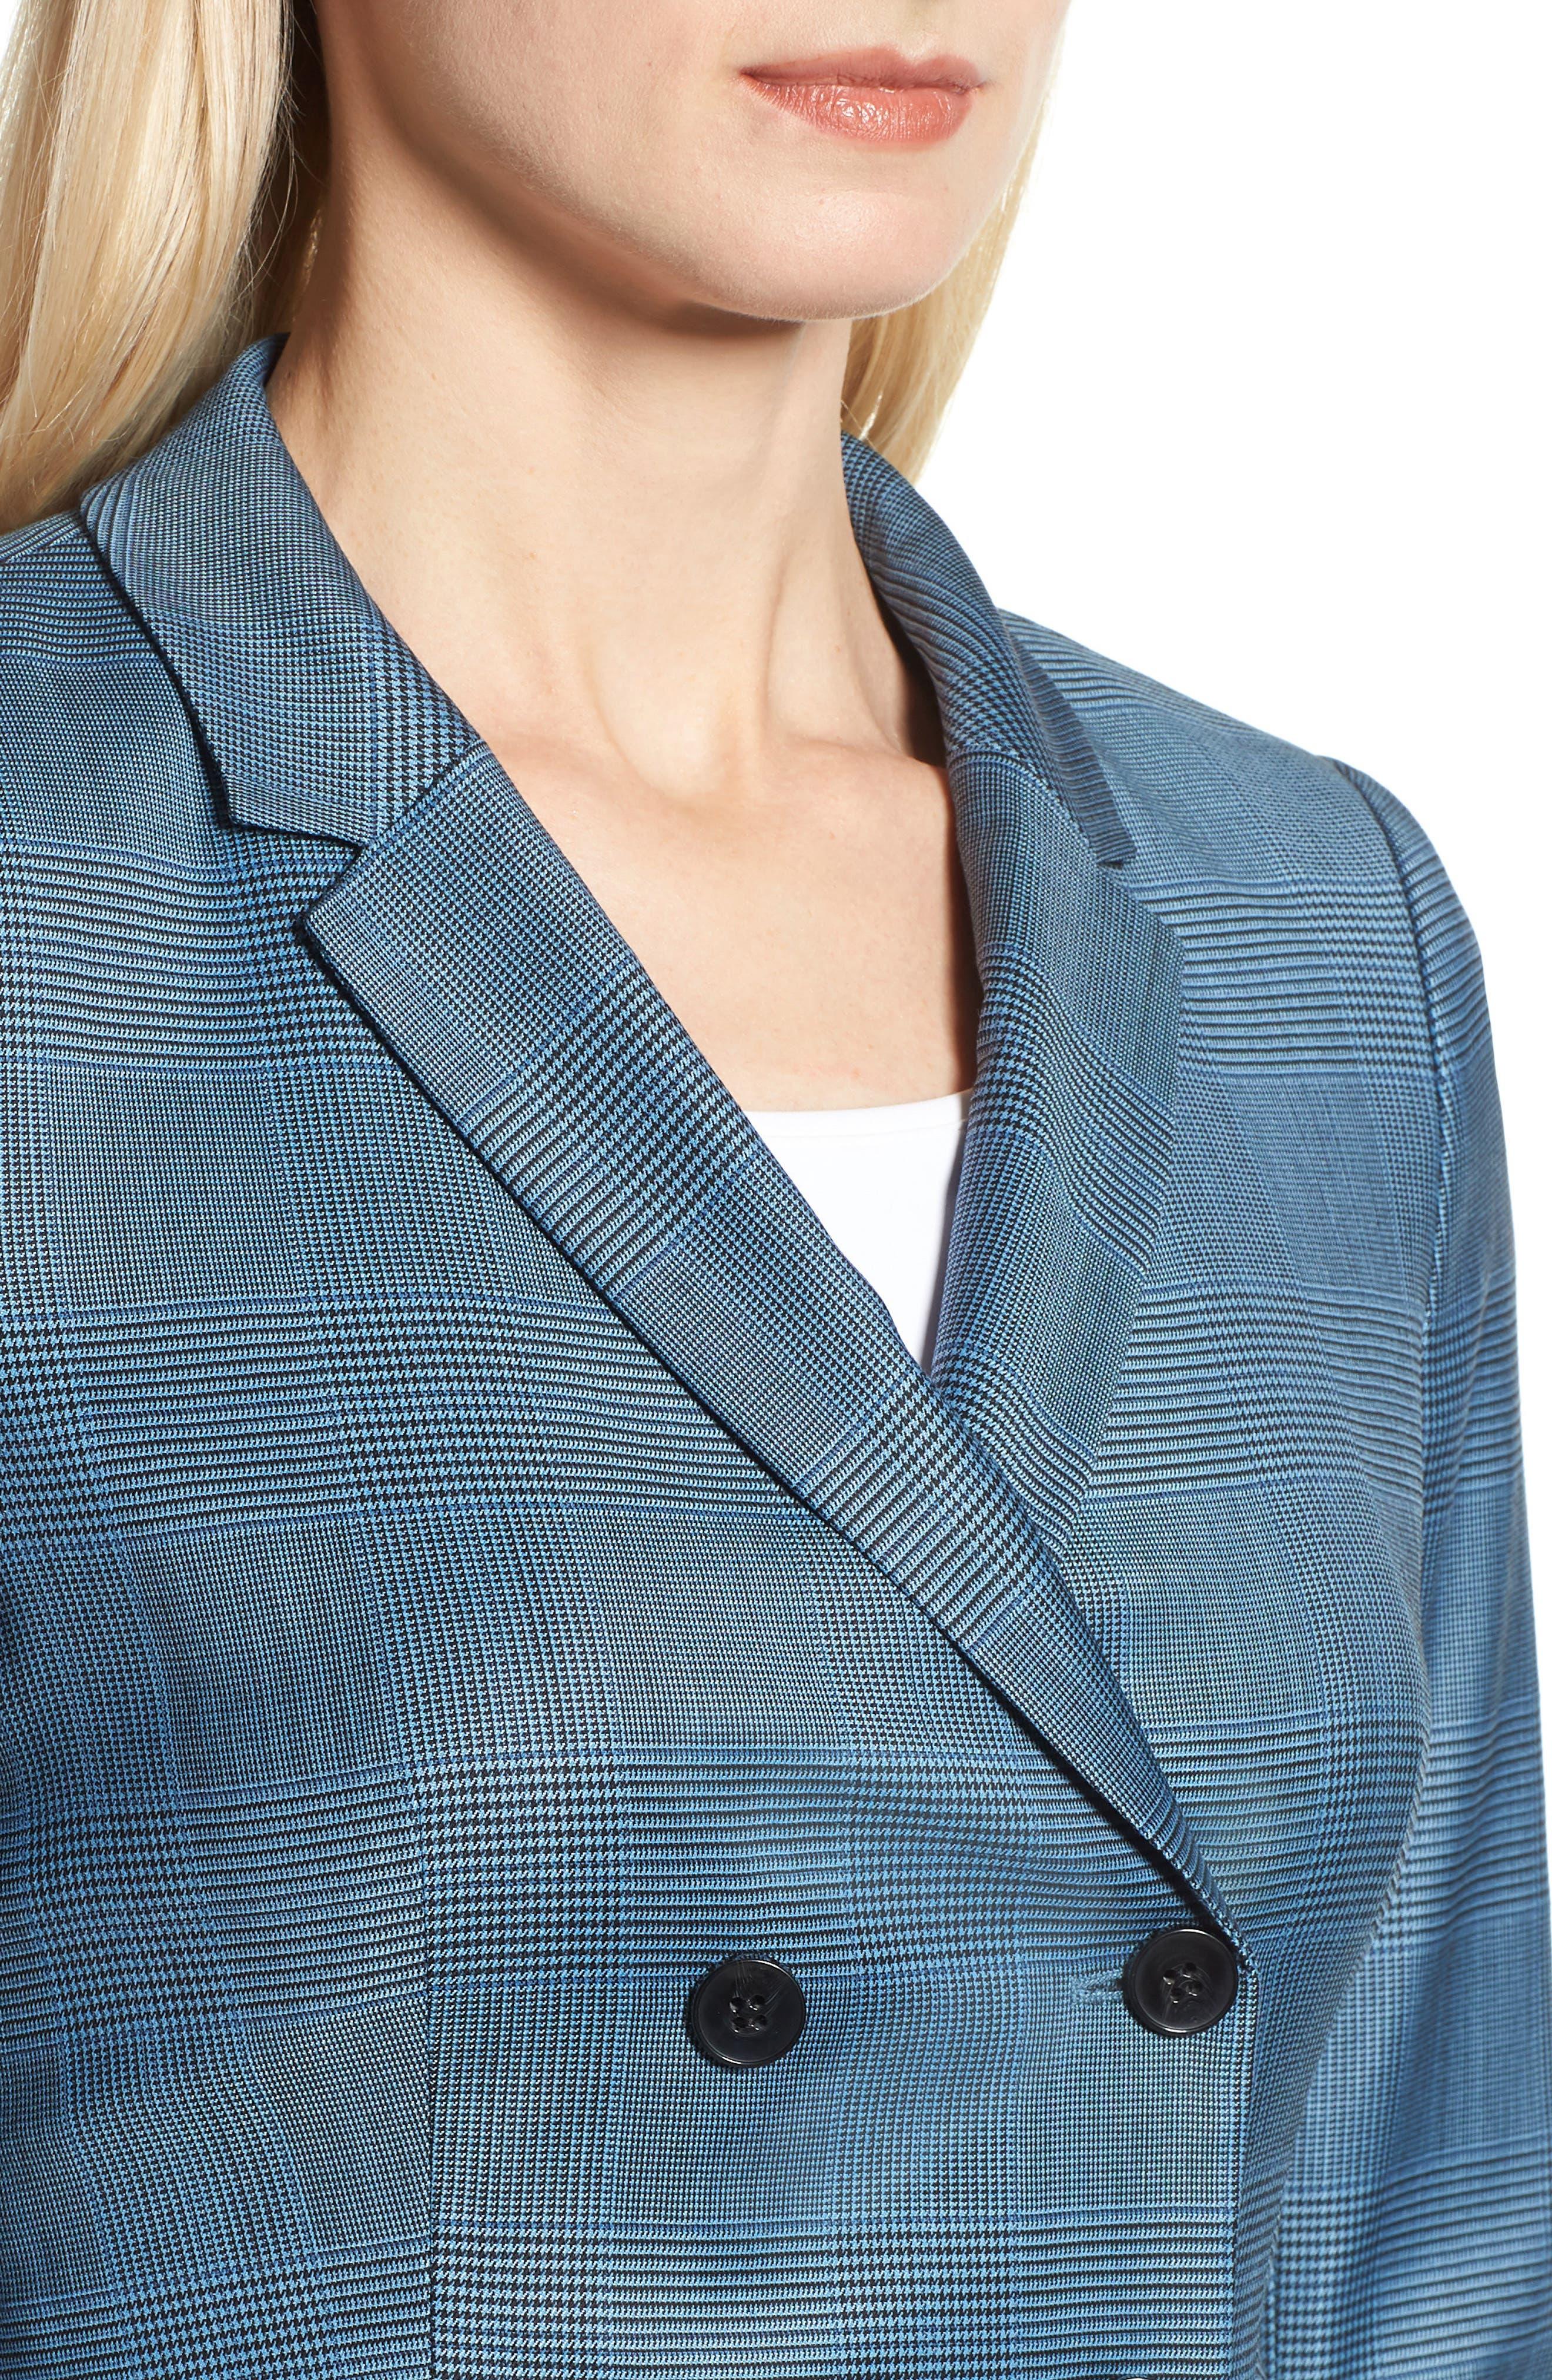 Jelaya Glencheck Double Breasted Suit Jacket,                             Alternate thumbnail 4, color,                             467